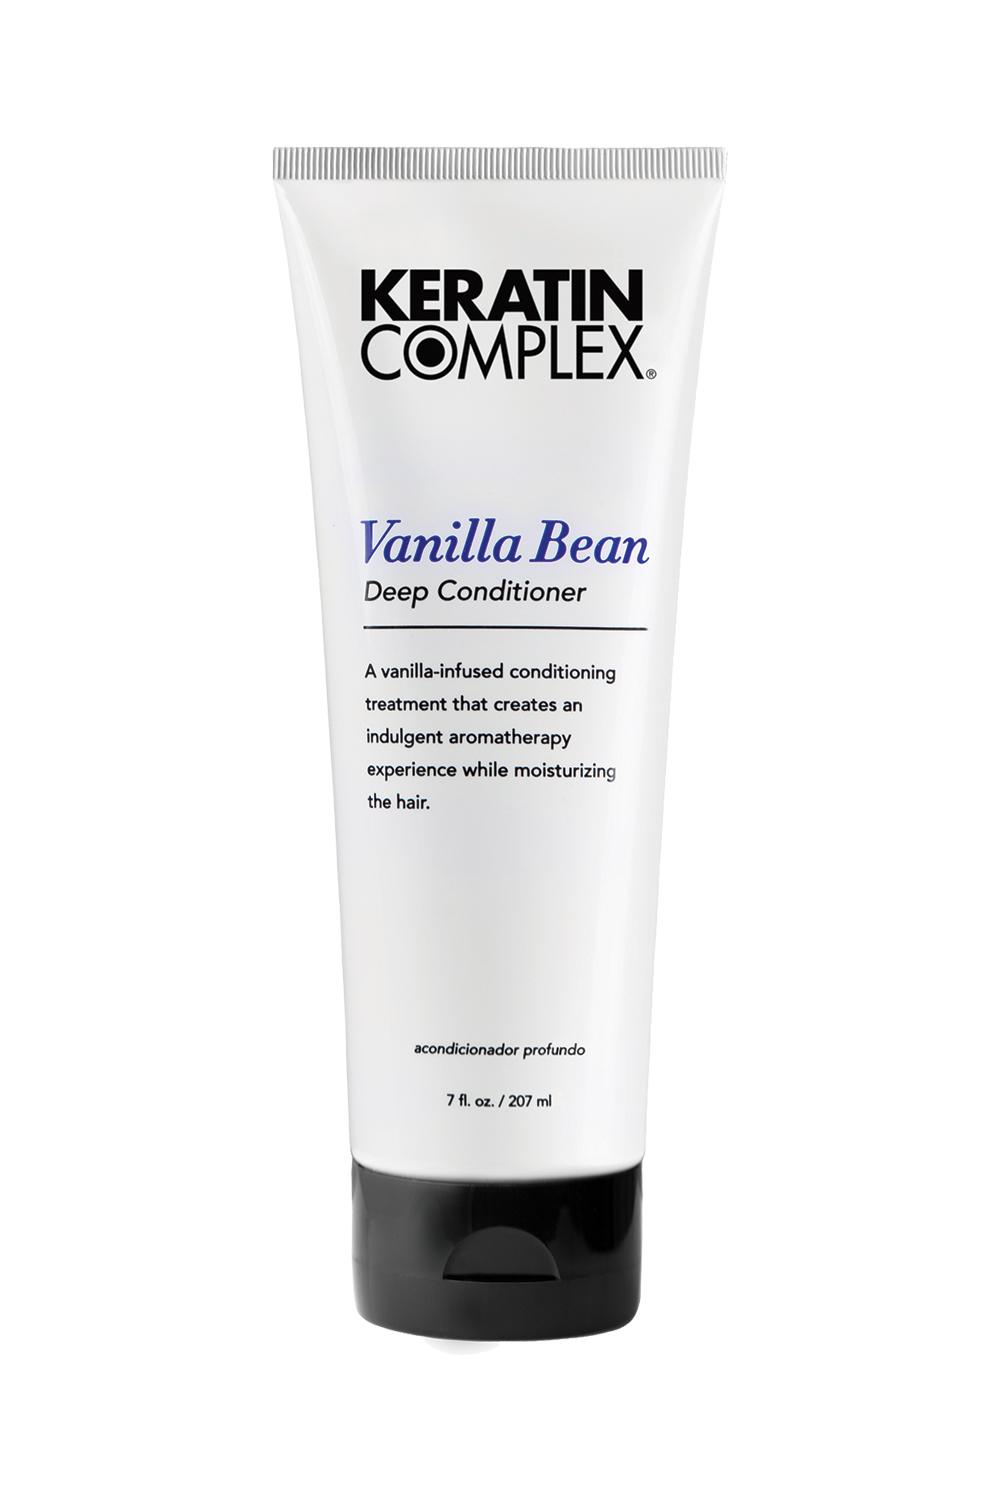 Pro Salon Brands— Keratin Complex Vanilla Bean Deep Conditioner